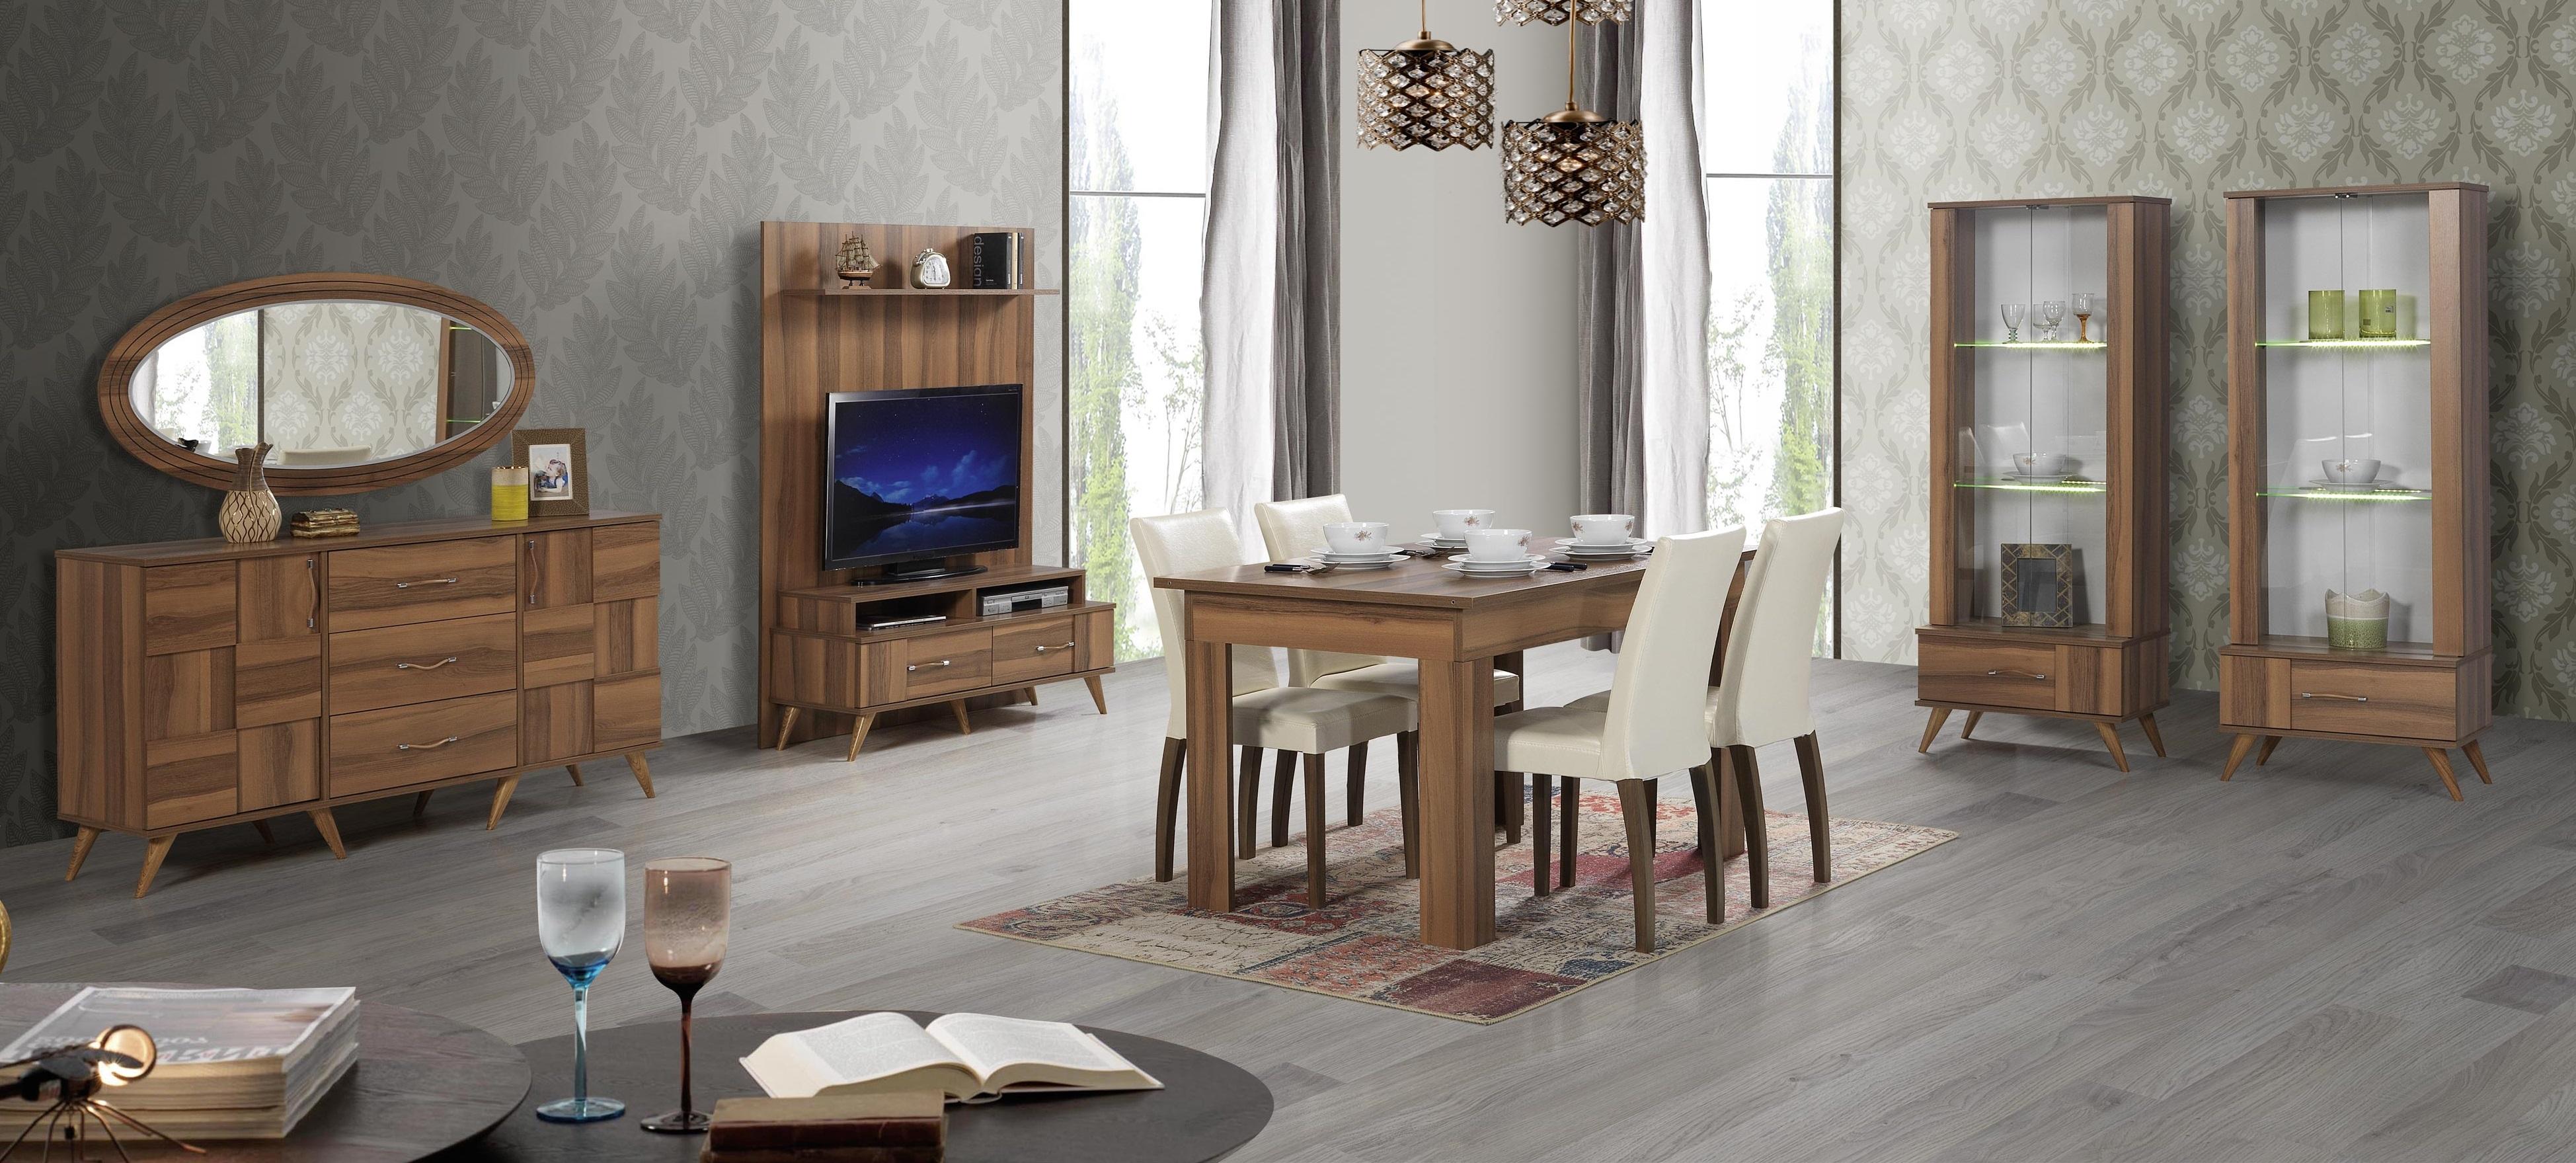 lotus esszimmer yuvam m belhaus in wuppertal cilek offizieller h ndler in europa. Black Bedroom Furniture Sets. Home Design Ideas